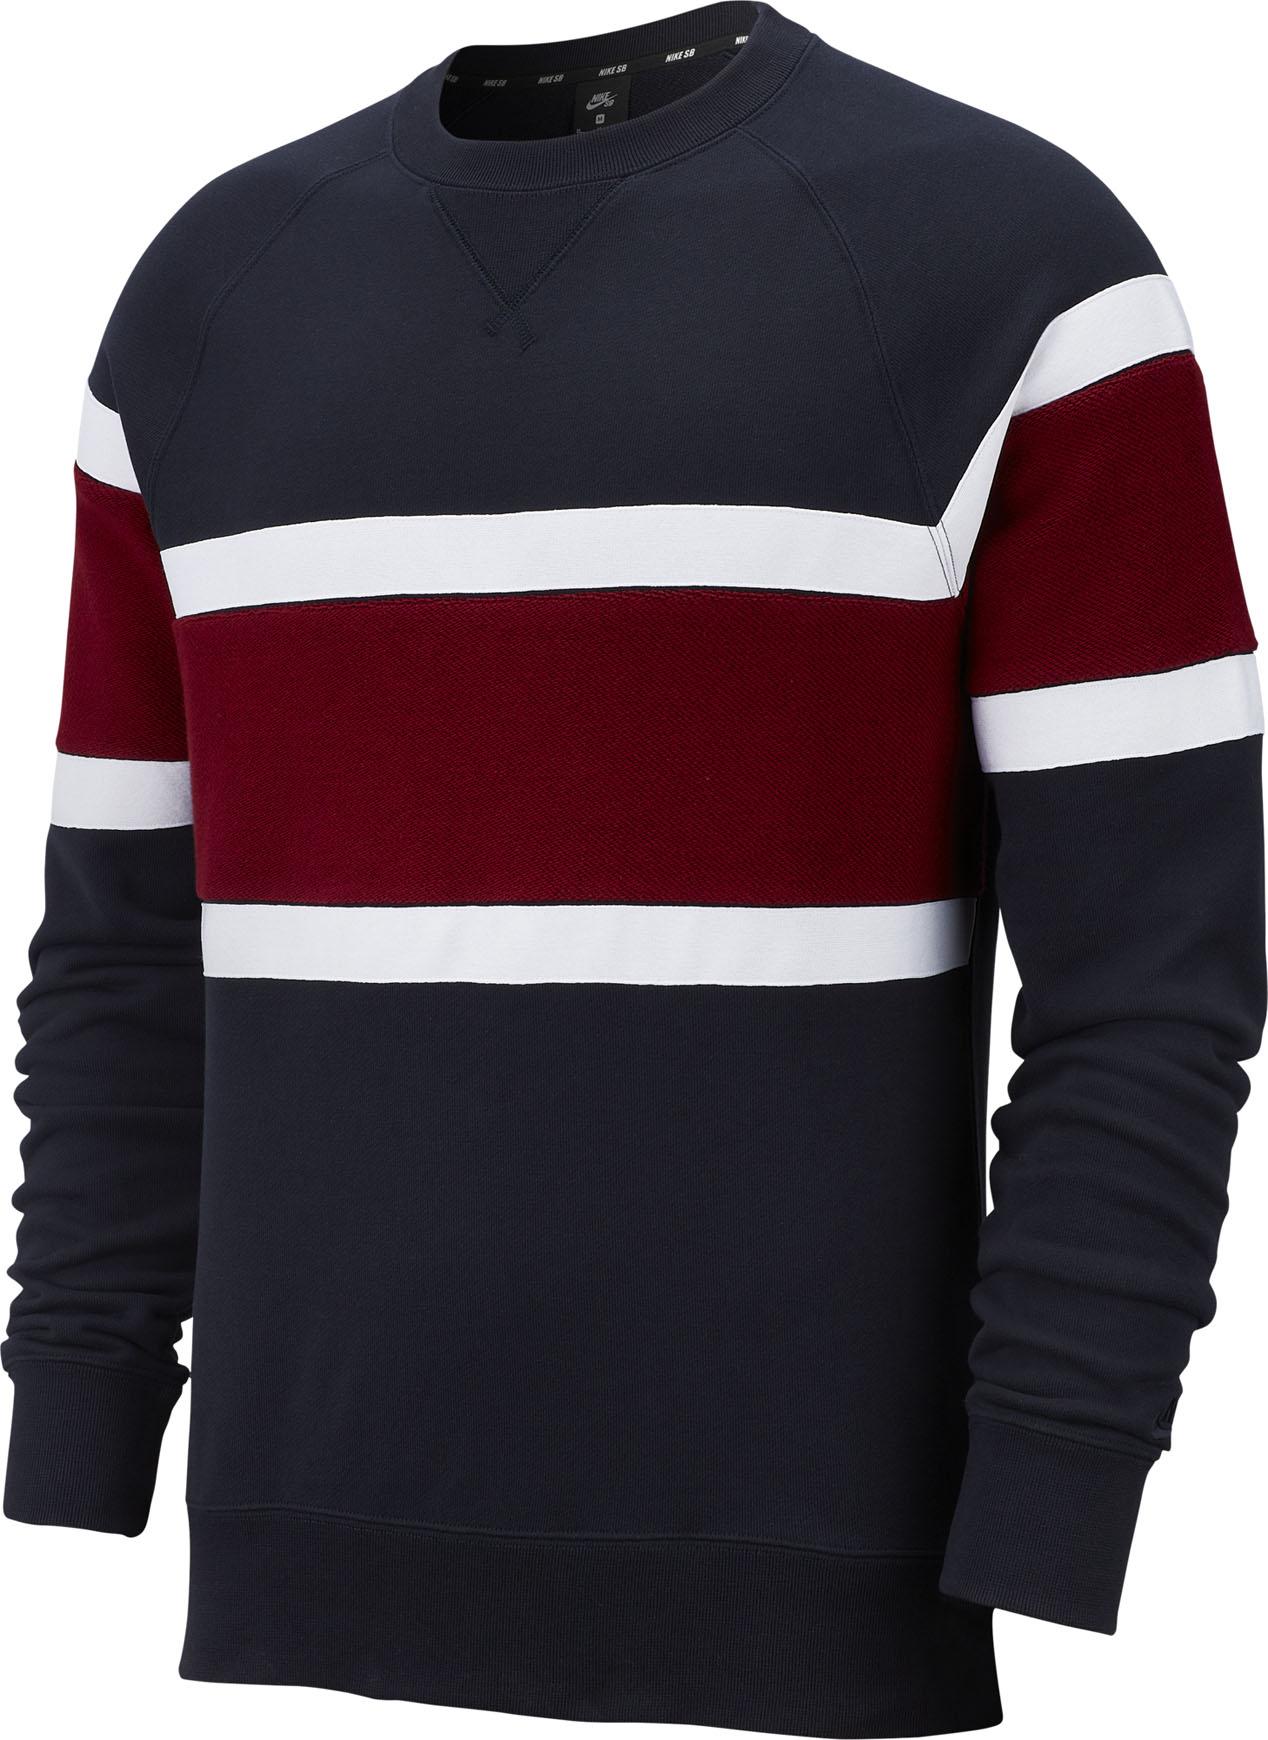 Nike SB Everett Crew Sweatshirt (dark obsidianteam reddark obsidian)